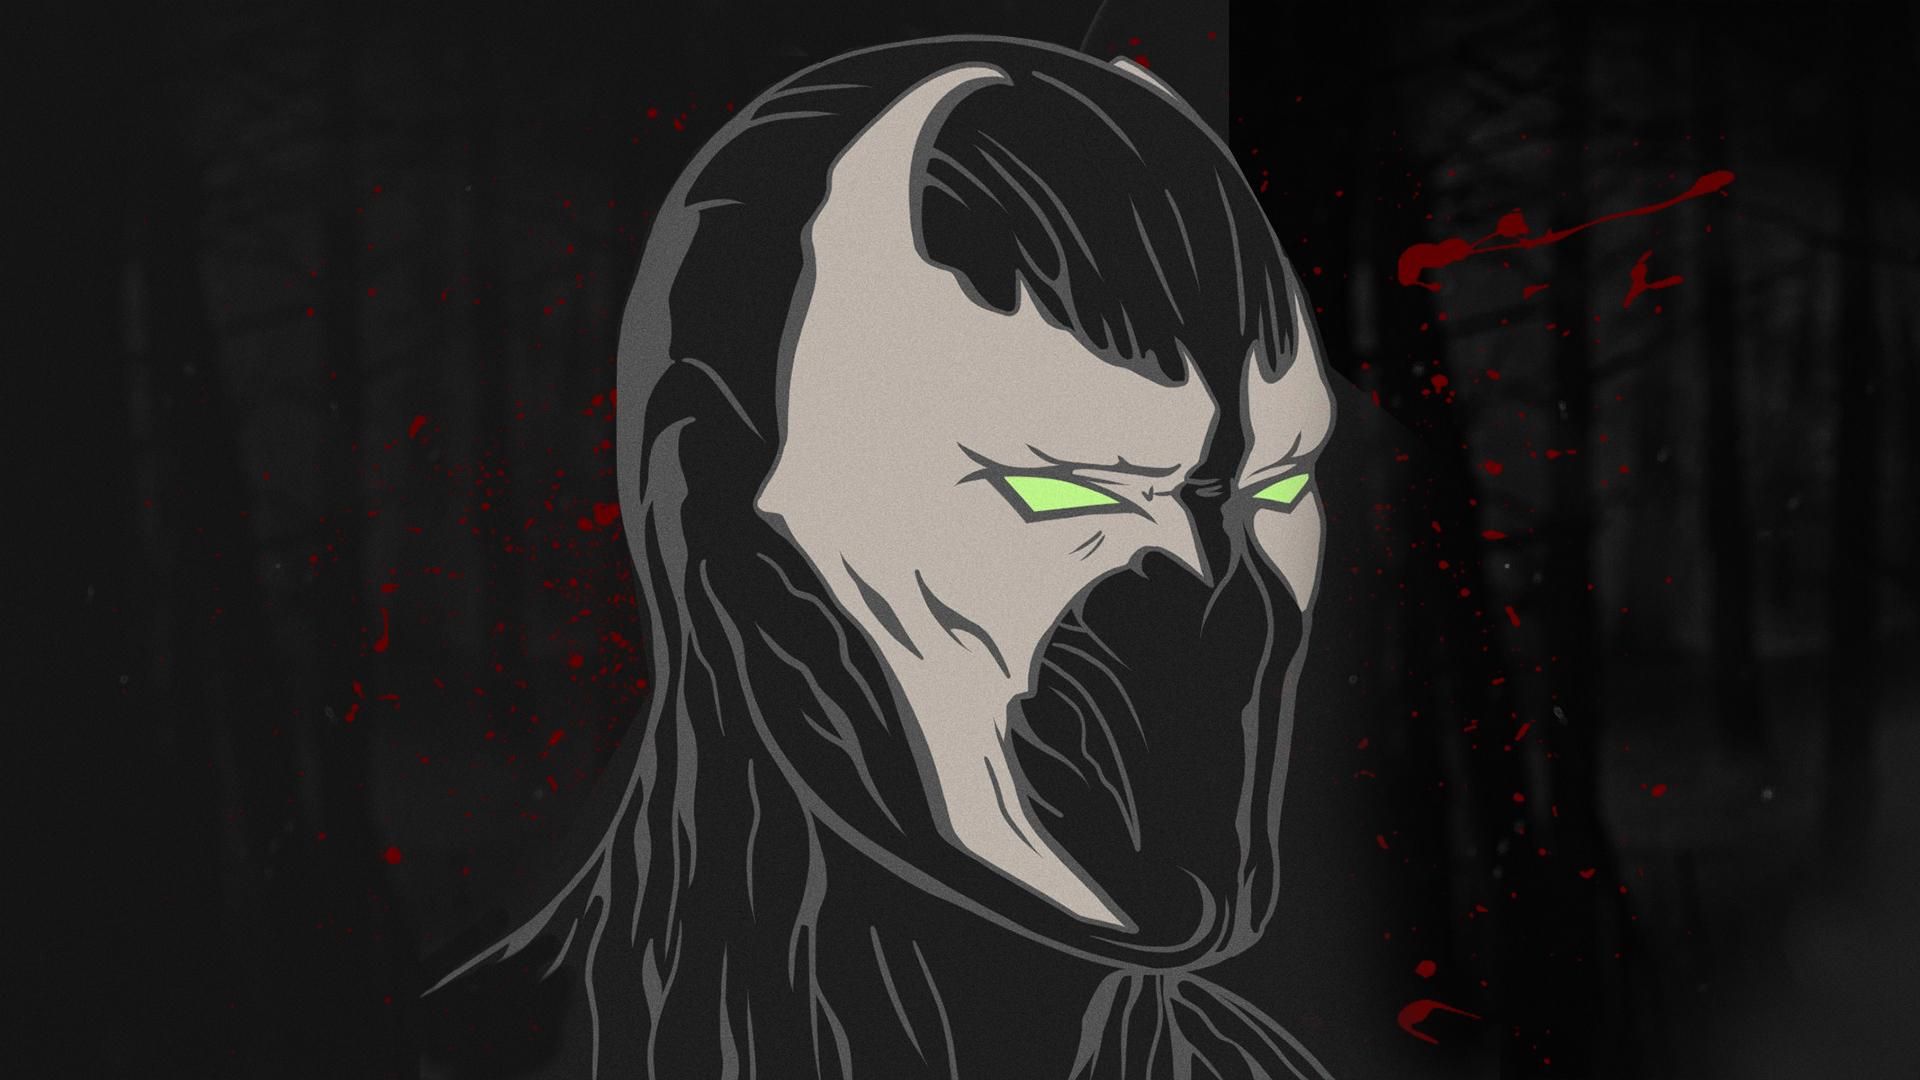 Wallpaper Mortal Kombat 11 Spawn